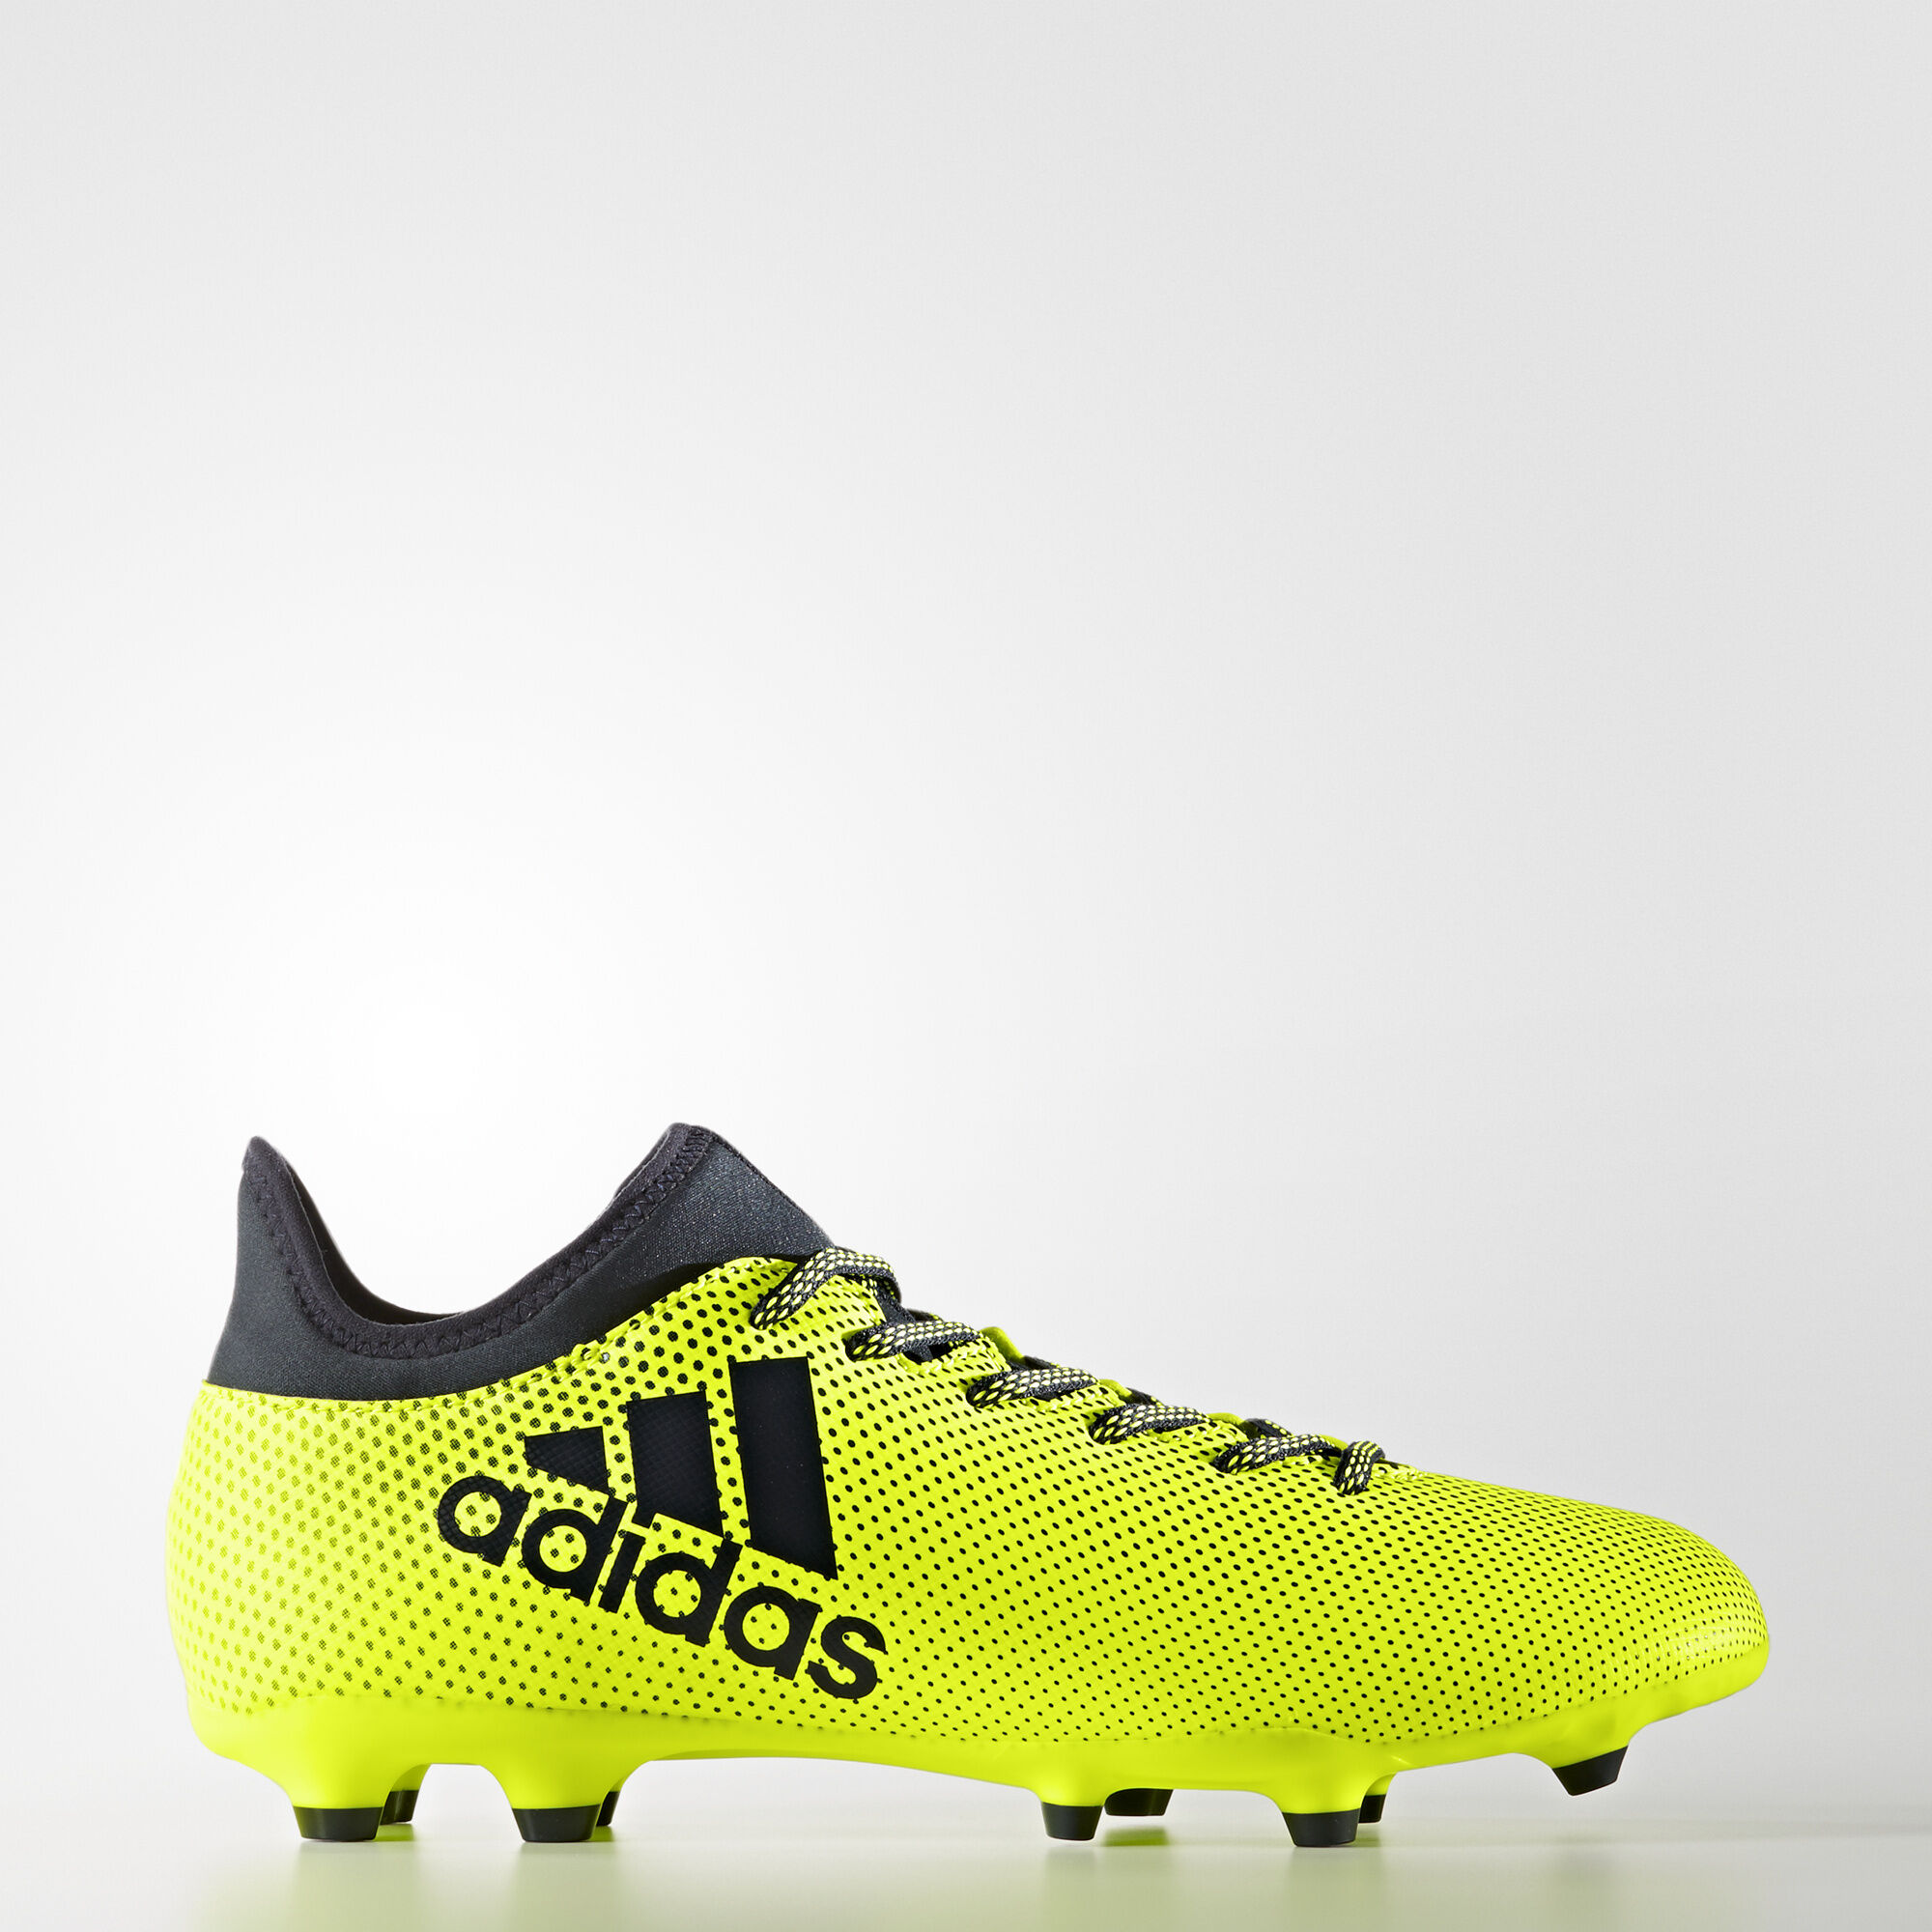 Adidas Bota de fútbol X 17.3 césped natural seco DjXPFy7